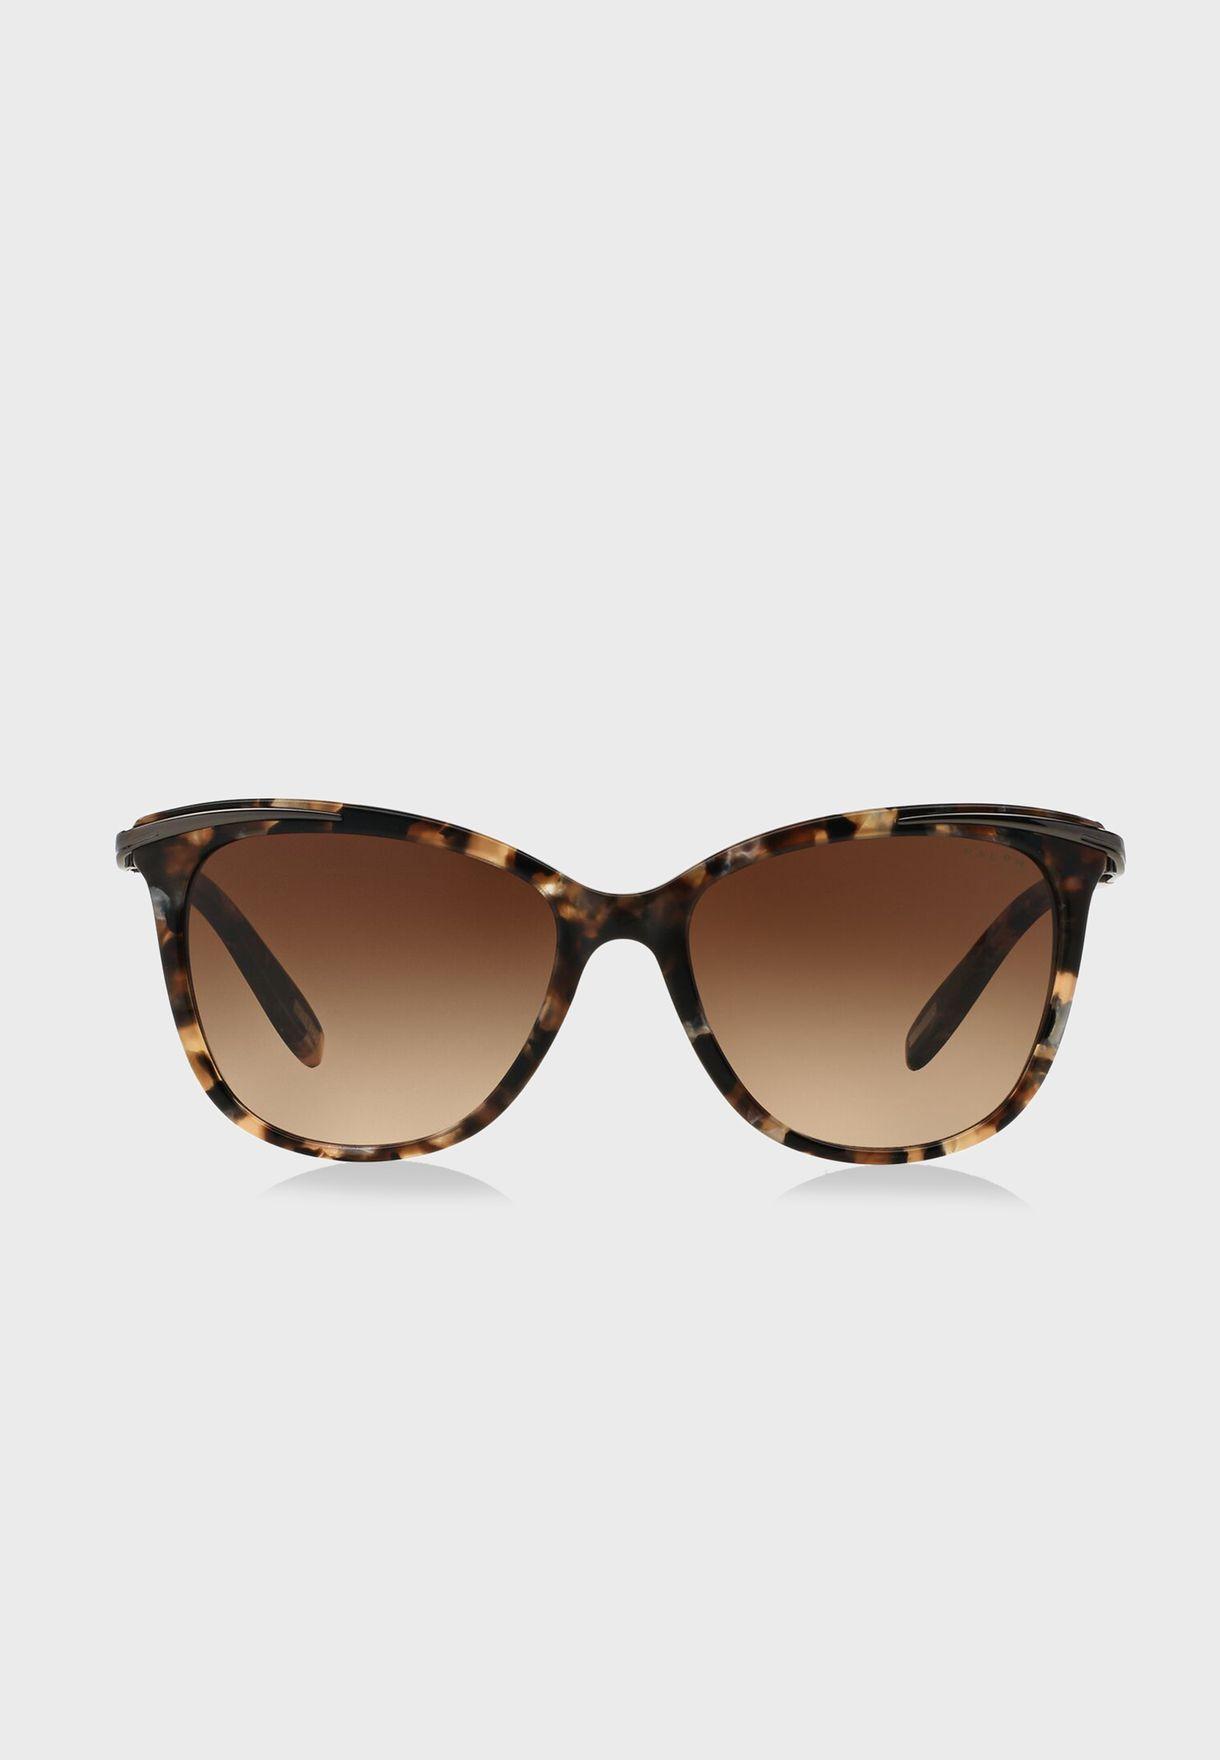 0RA5203 Cat Eye Sunglasses